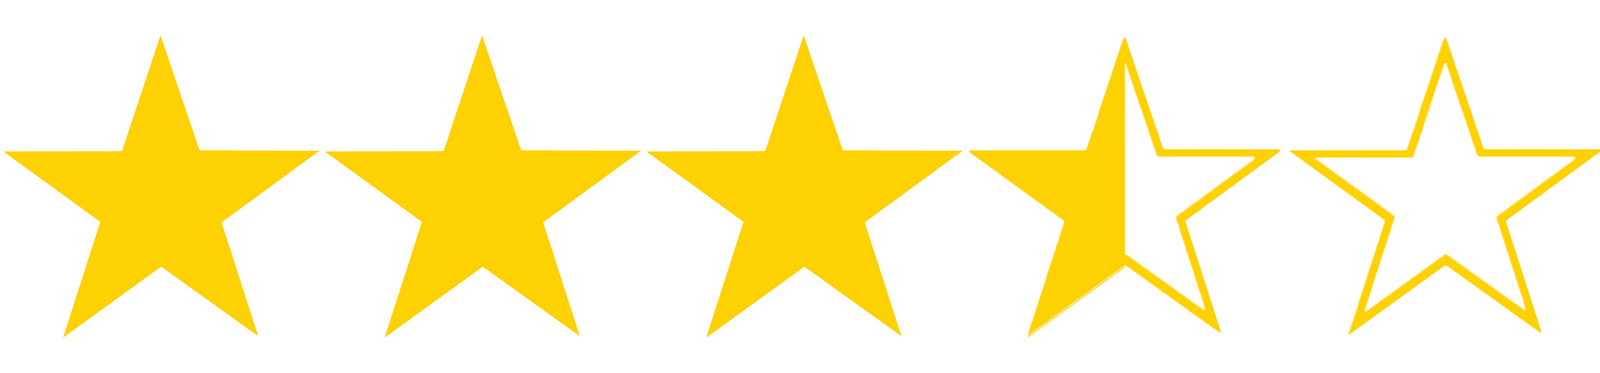 http://tnpsccoachingcentresinchennai.in/wp-content/uploads/2017/08/3-5-stars.png